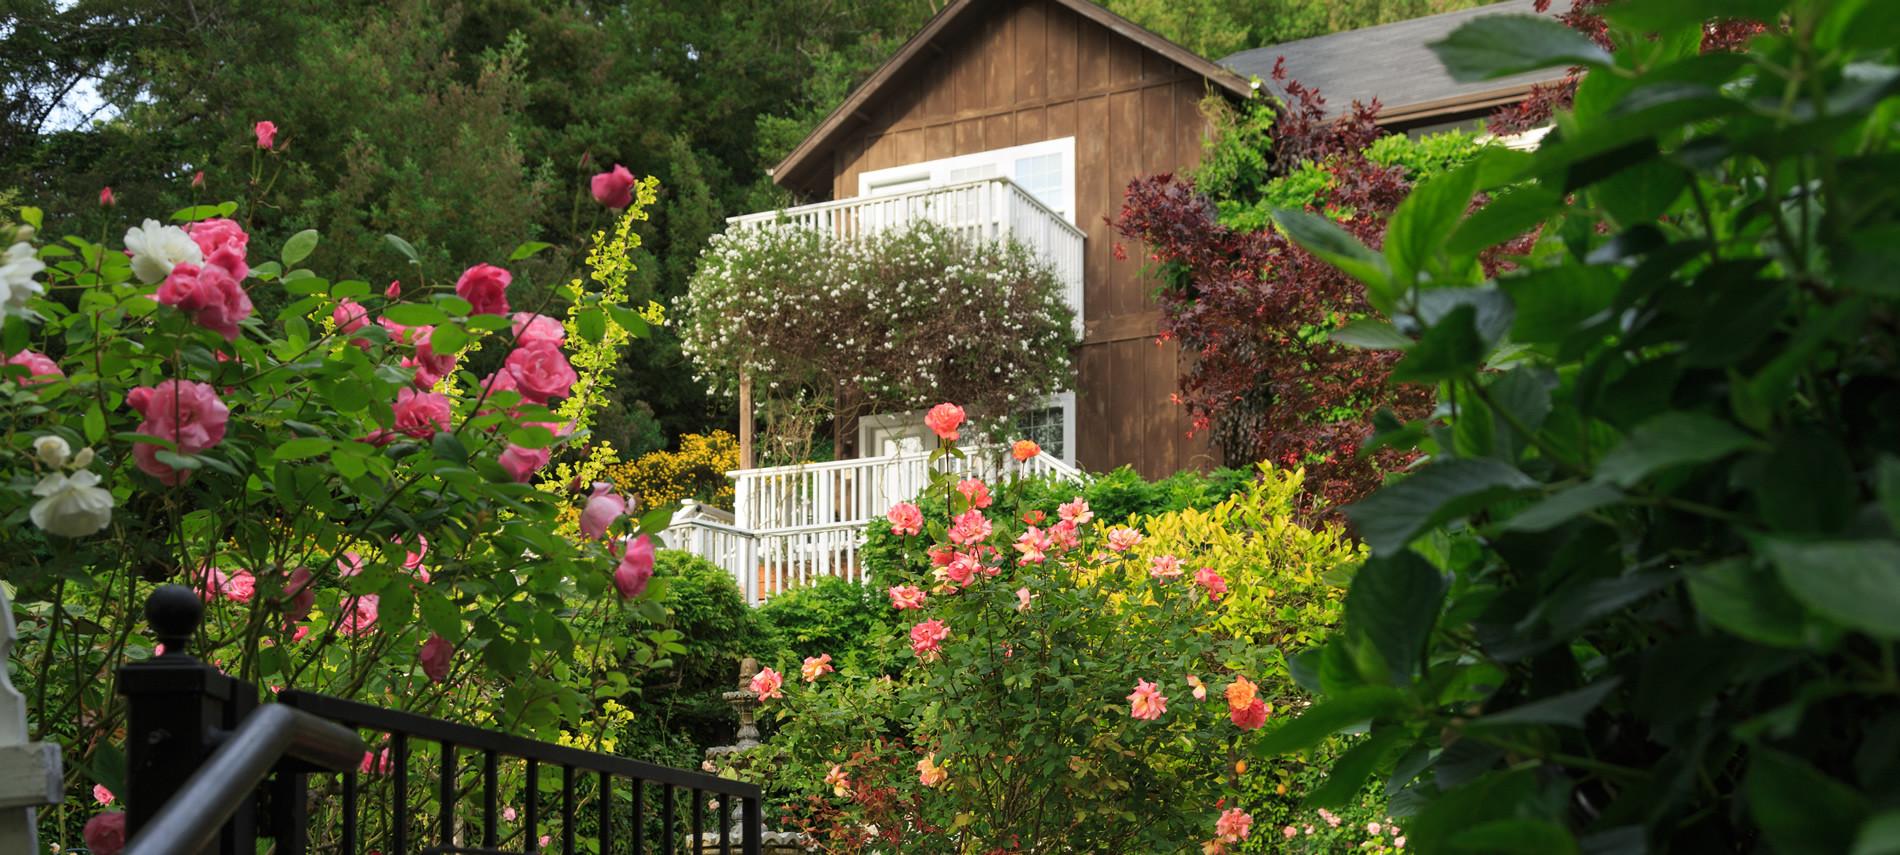 sonoma county lodging